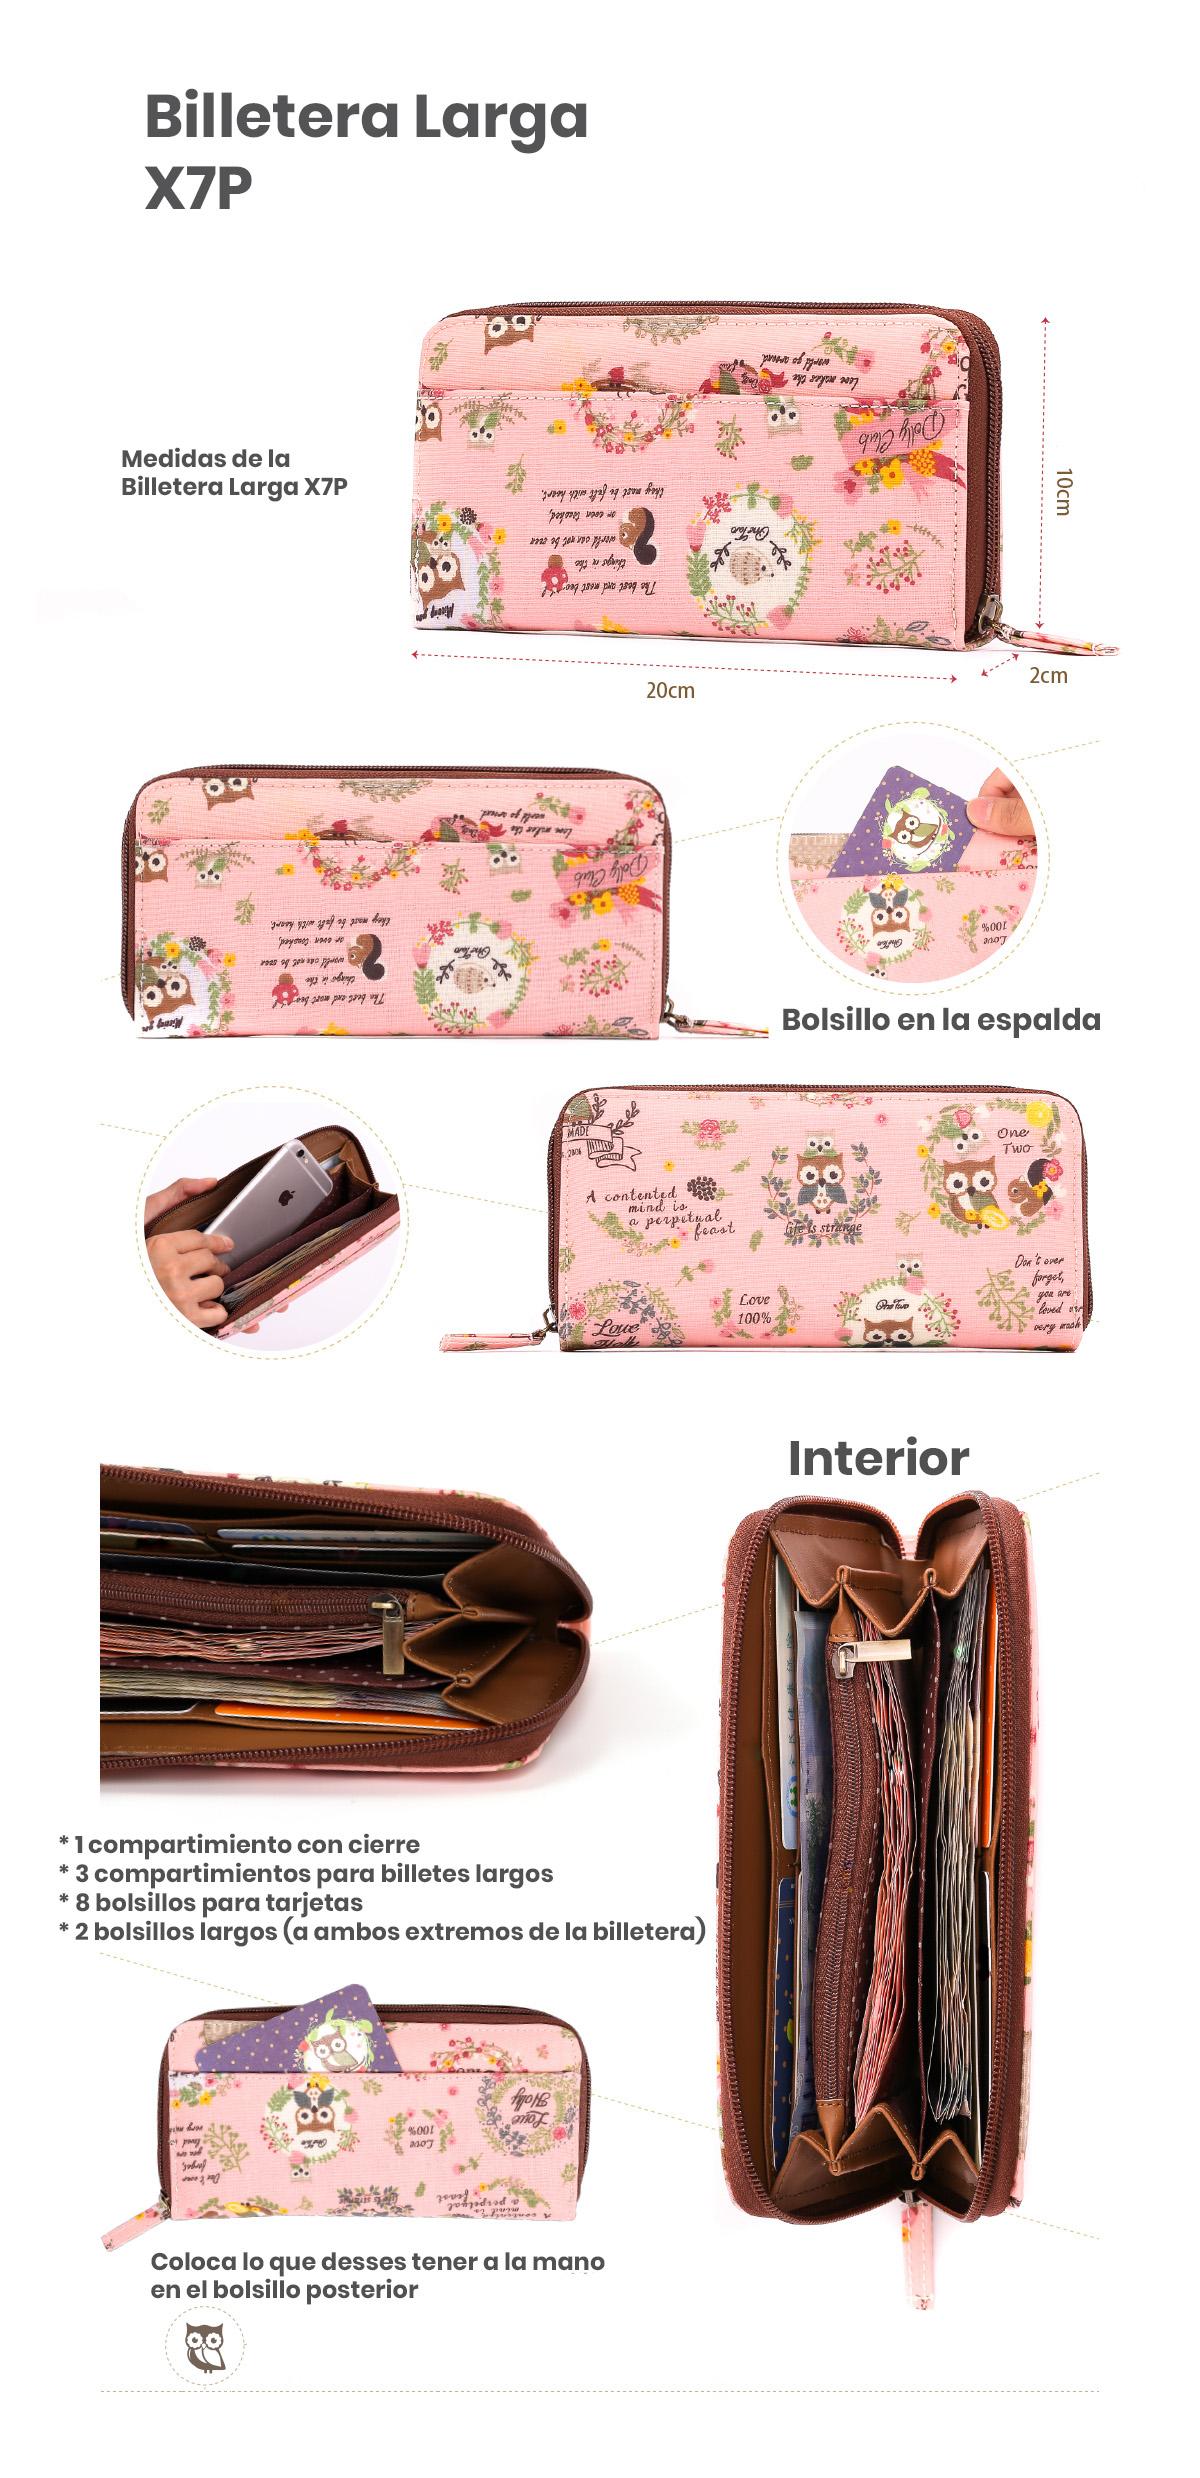 detalles billetera X7P